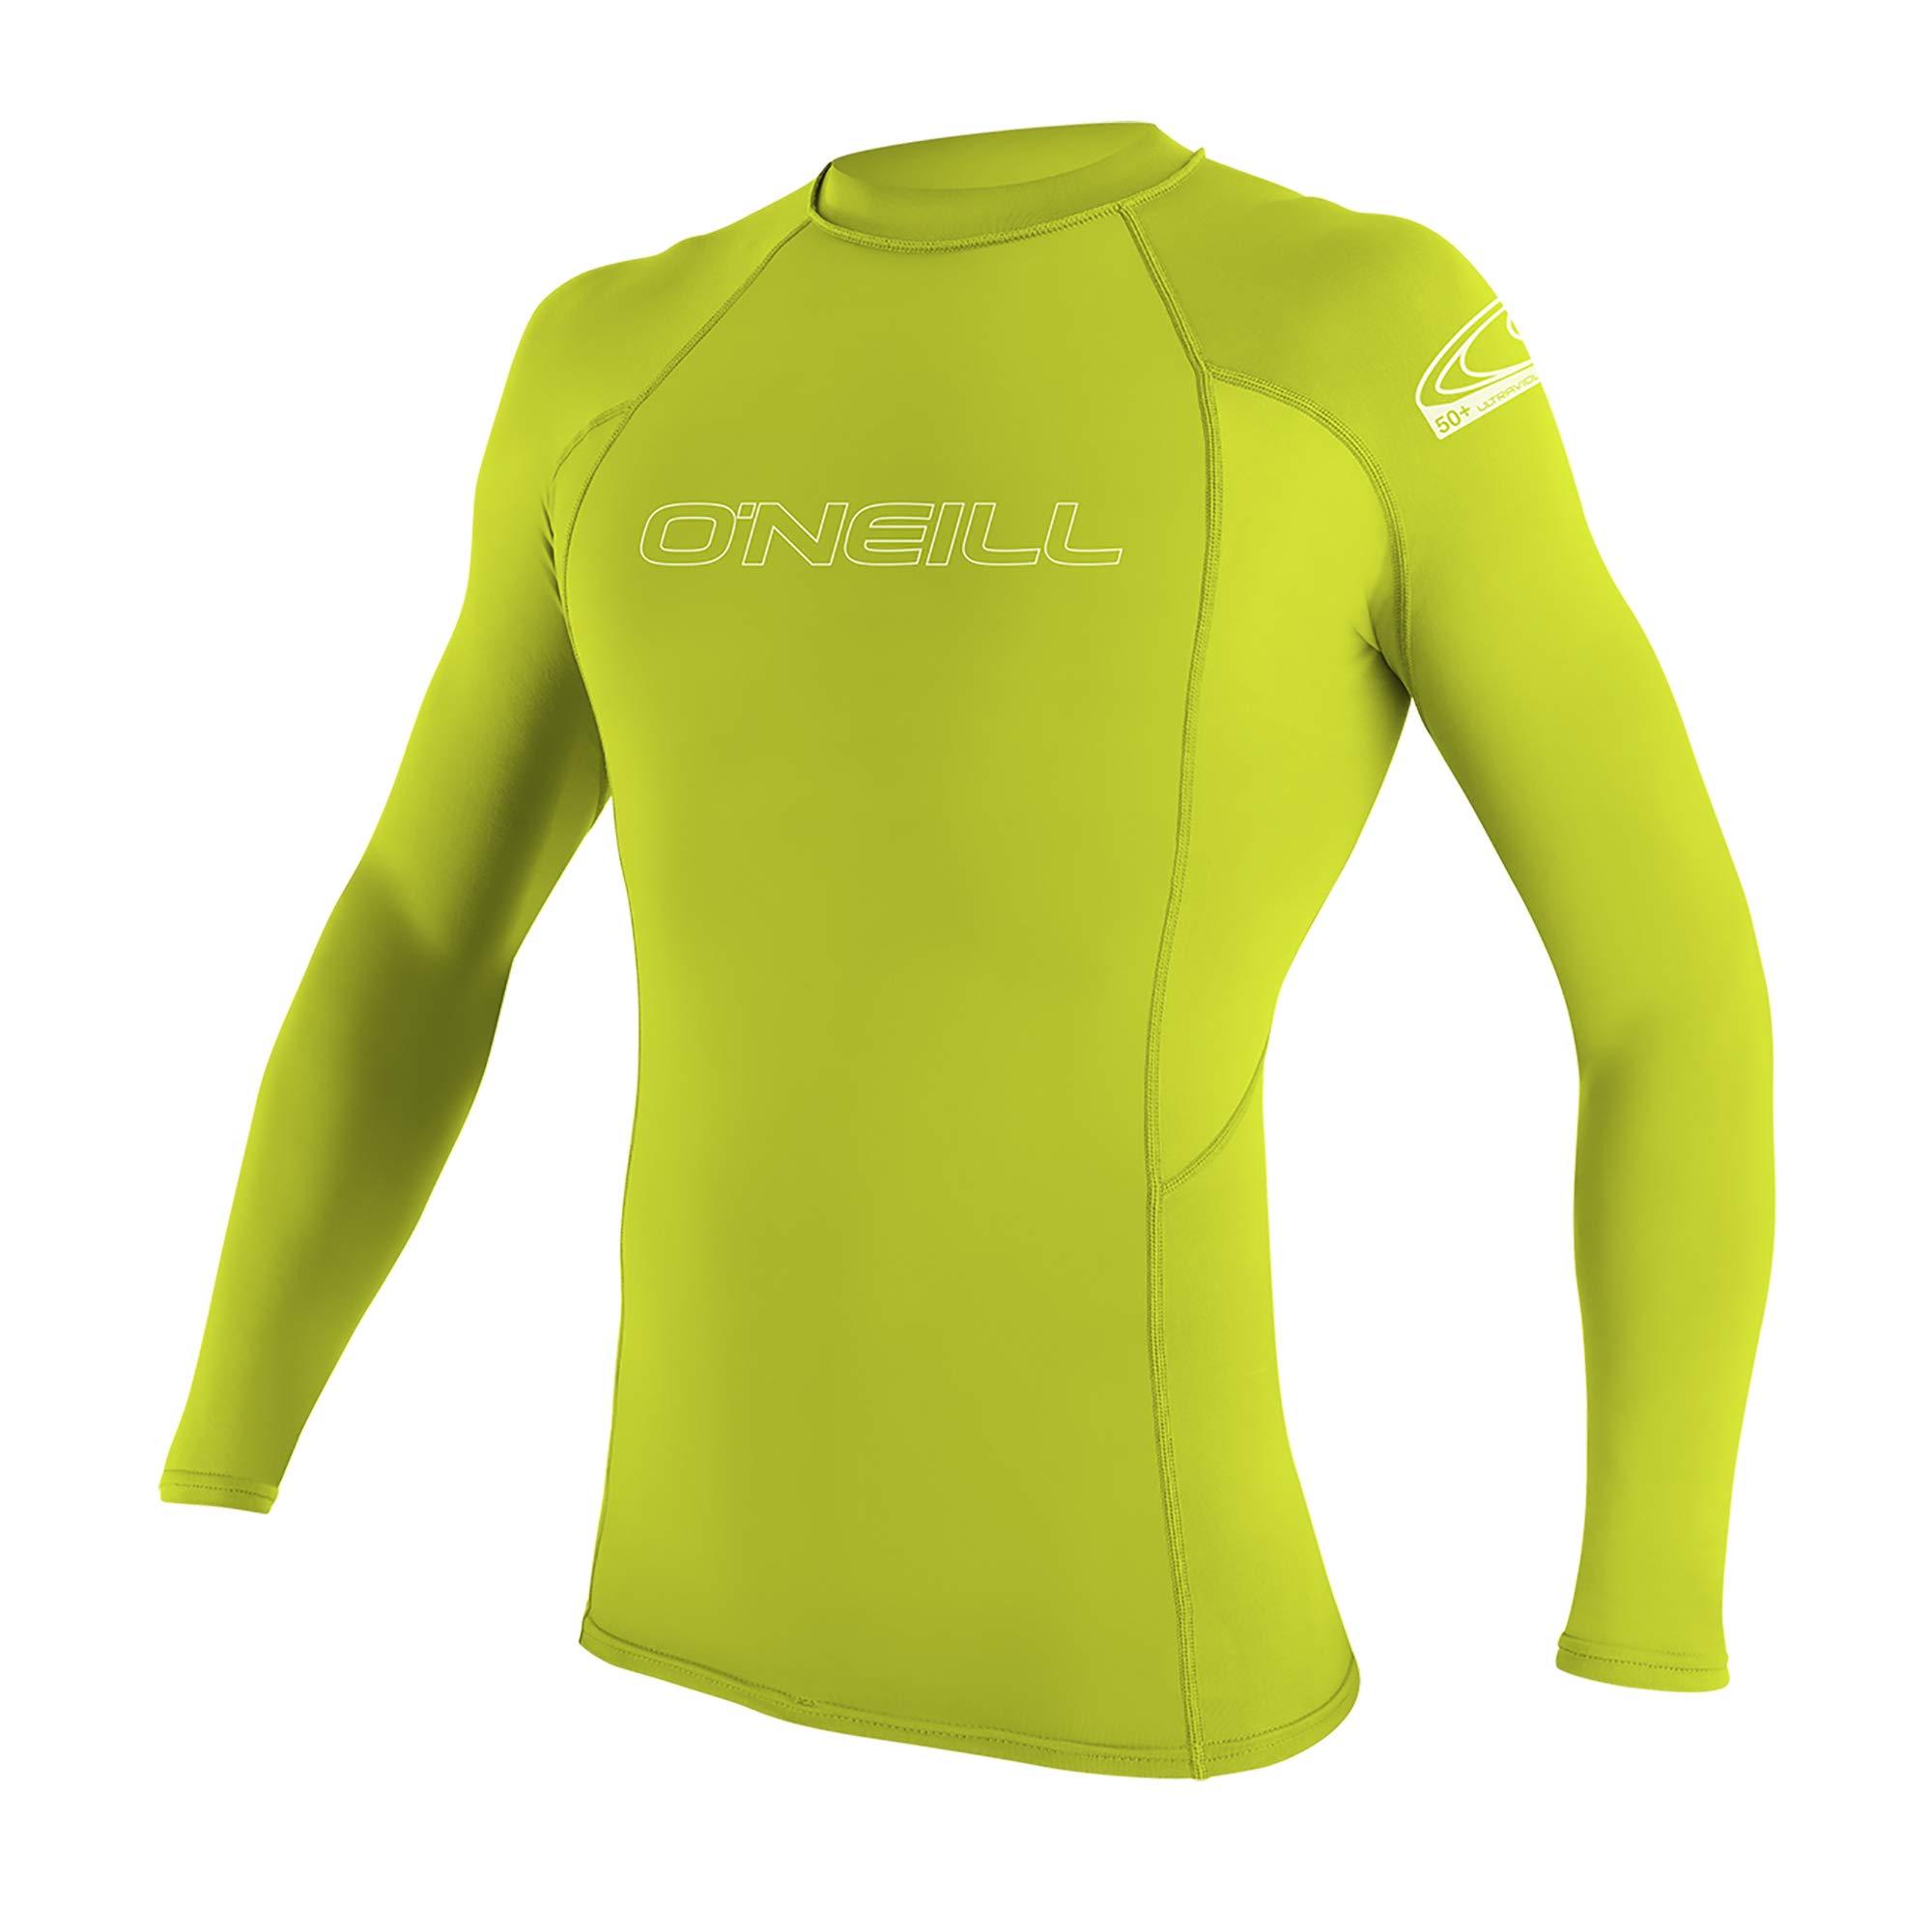 O'Neill Youth Basic Skins UPF 50+ Long Sleeve Rash Guard, Lime, 14 by O'Neill Wetsuits